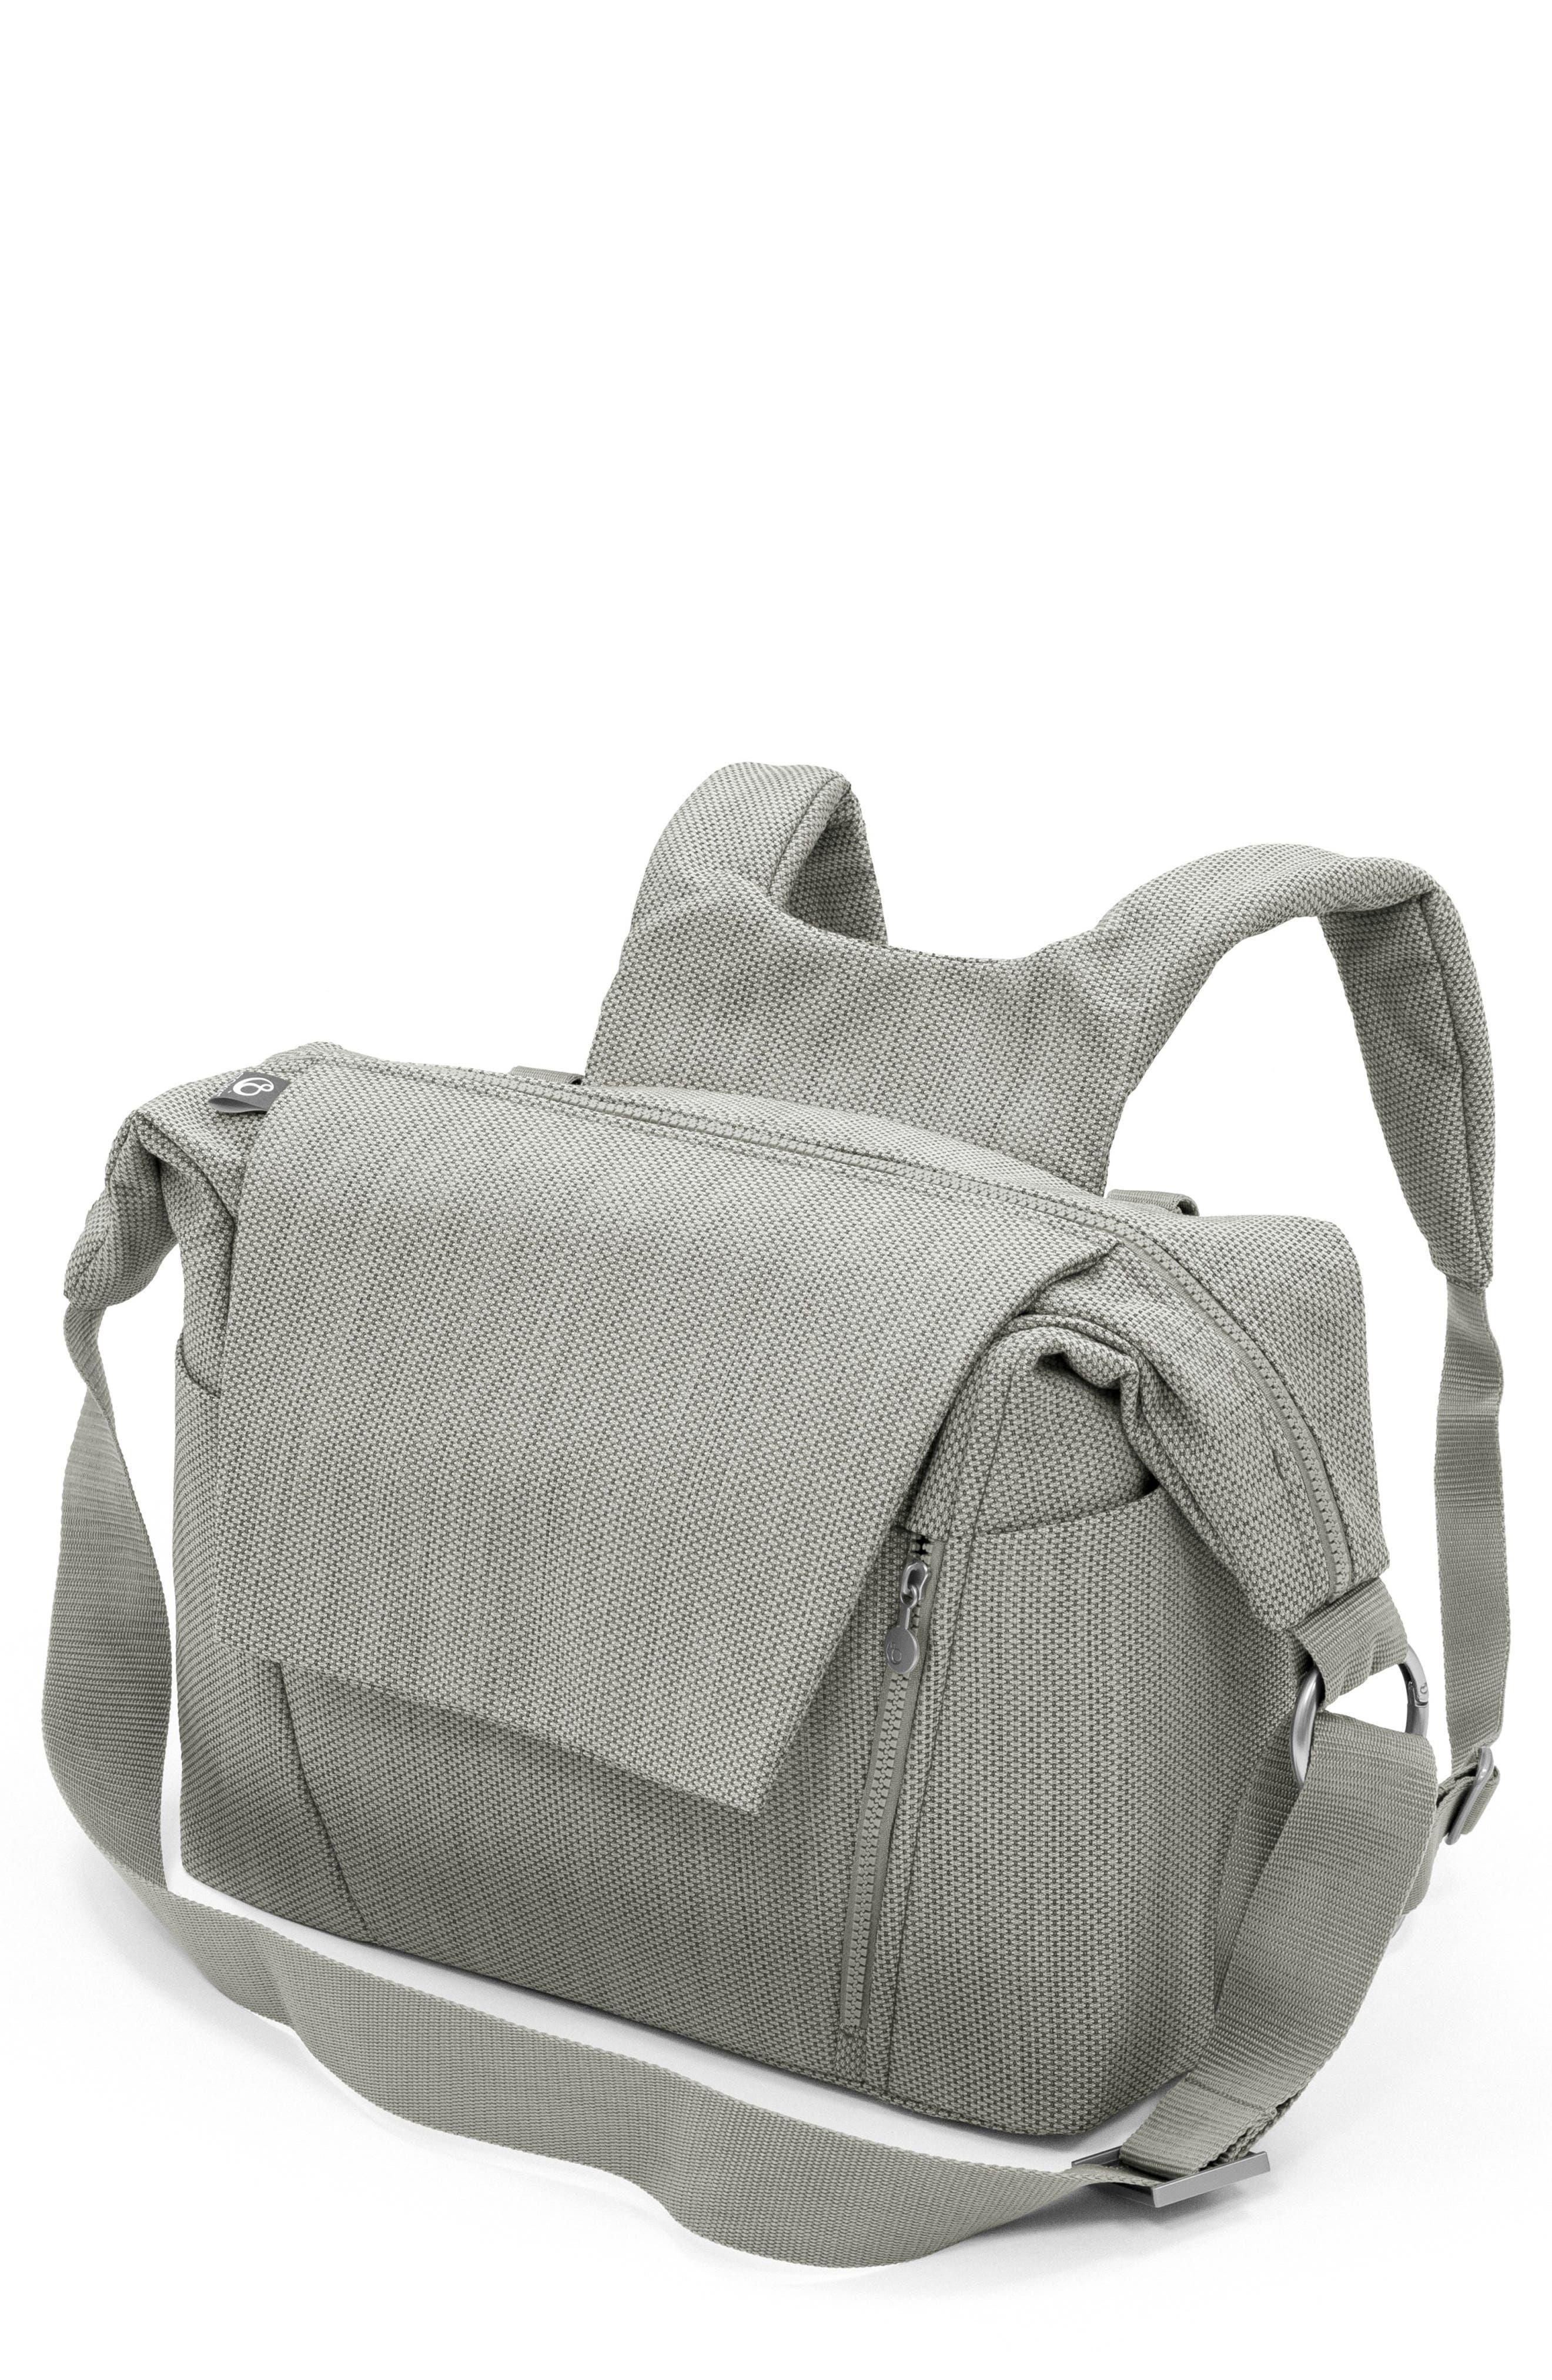 Convertible Diaper Bag,                             Main thumbnail 1, color,                             BRUSHED GREY